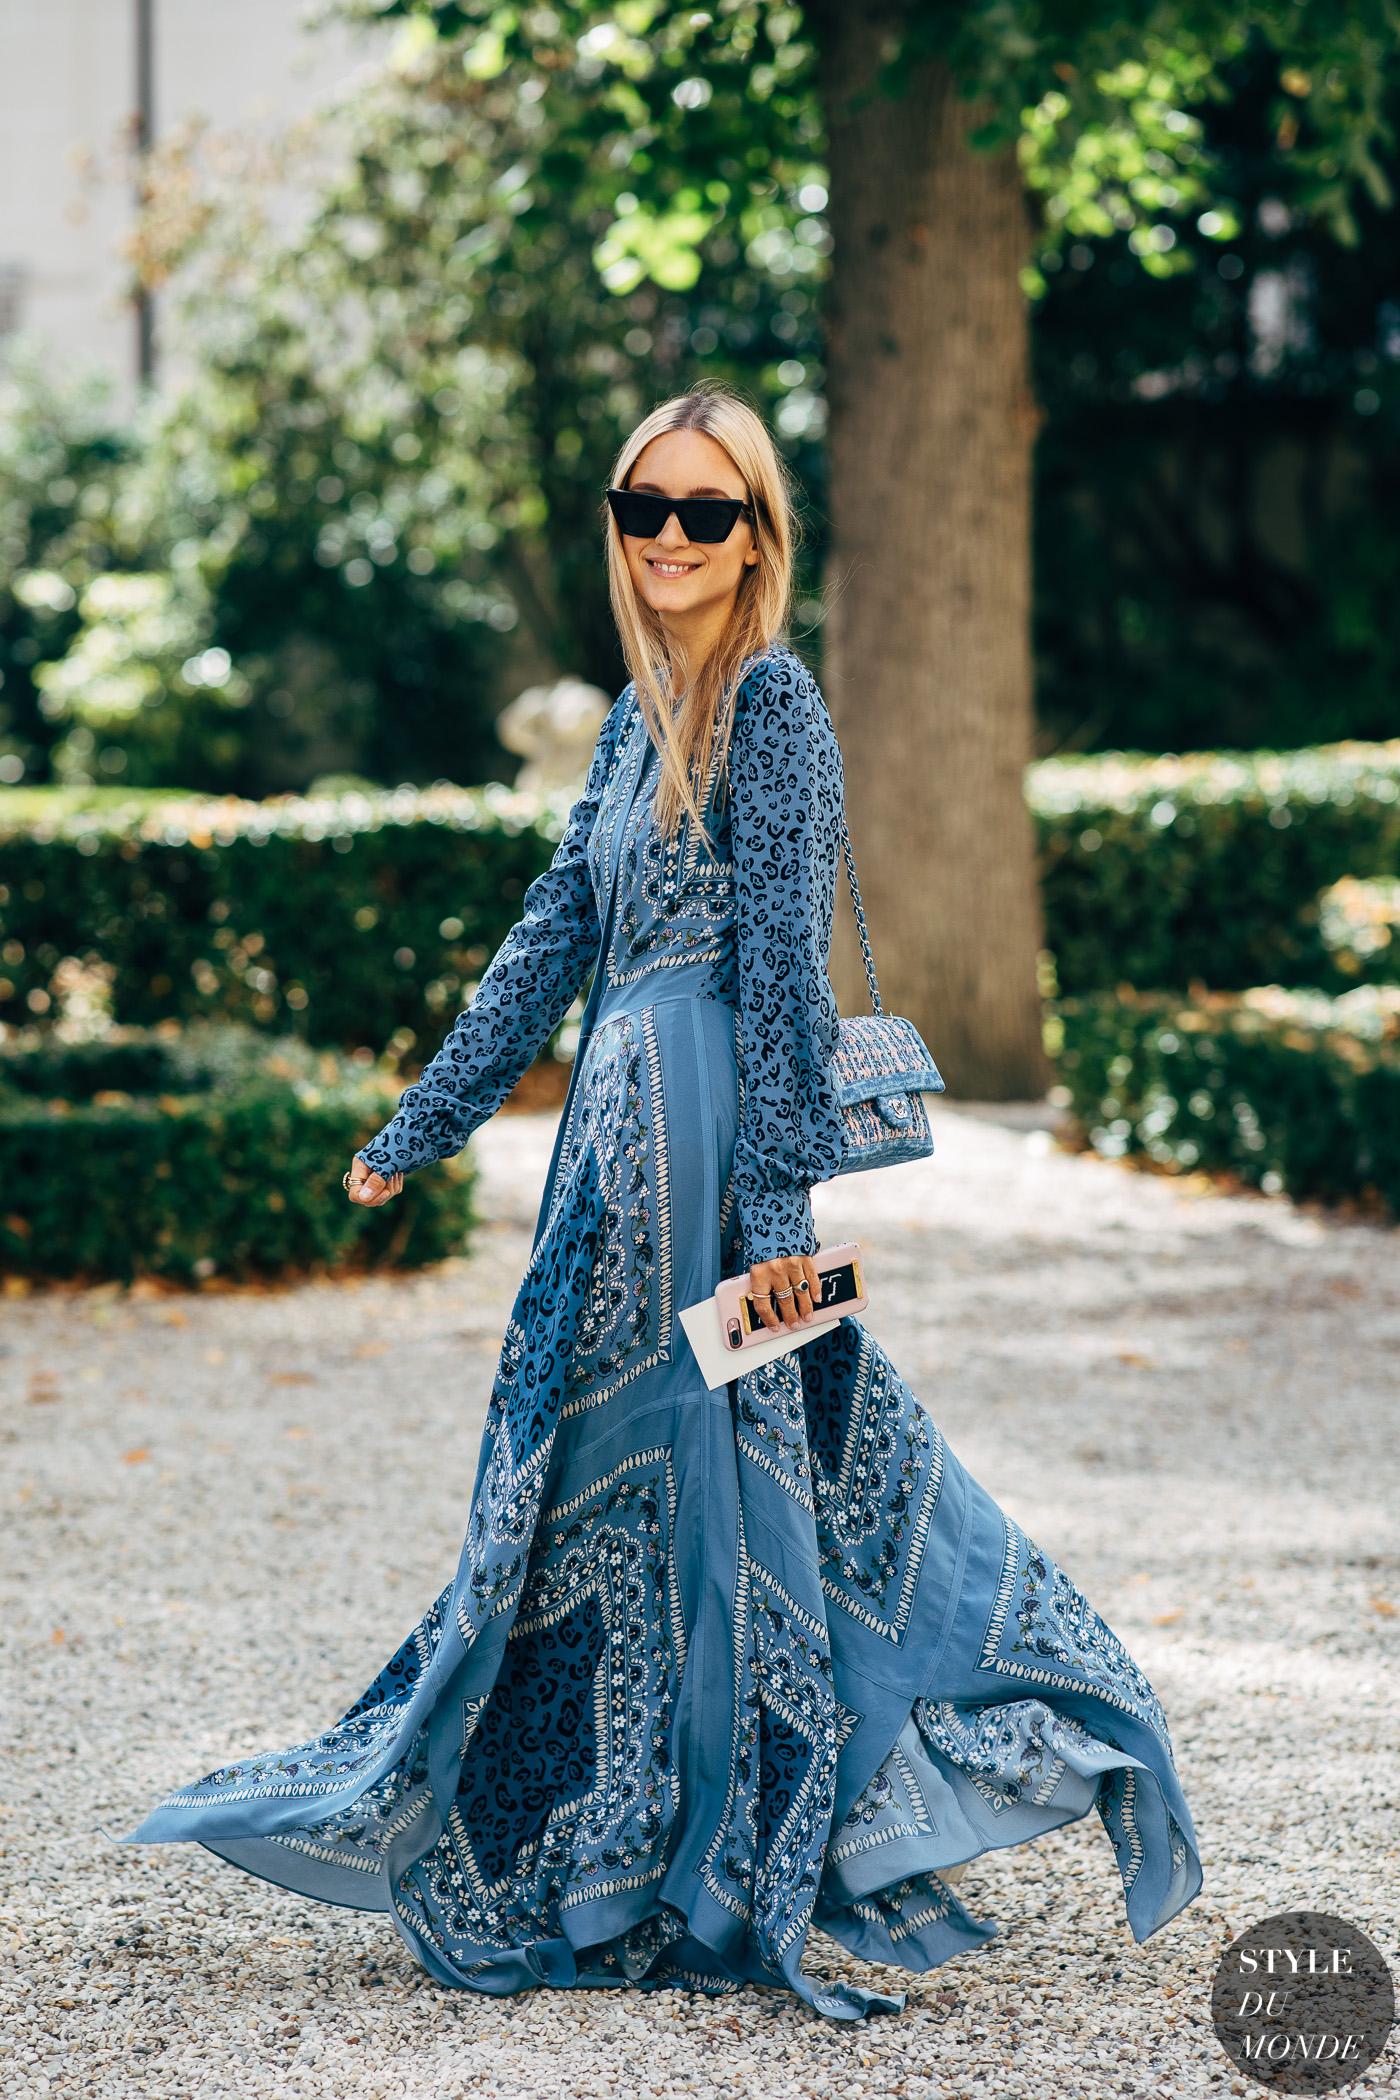 Paris SS 2019 Street Style: Charlotte Groeneveld - STYLE DU MONDE   Street Style Street Fashion Photos Charlotte Groeneveld